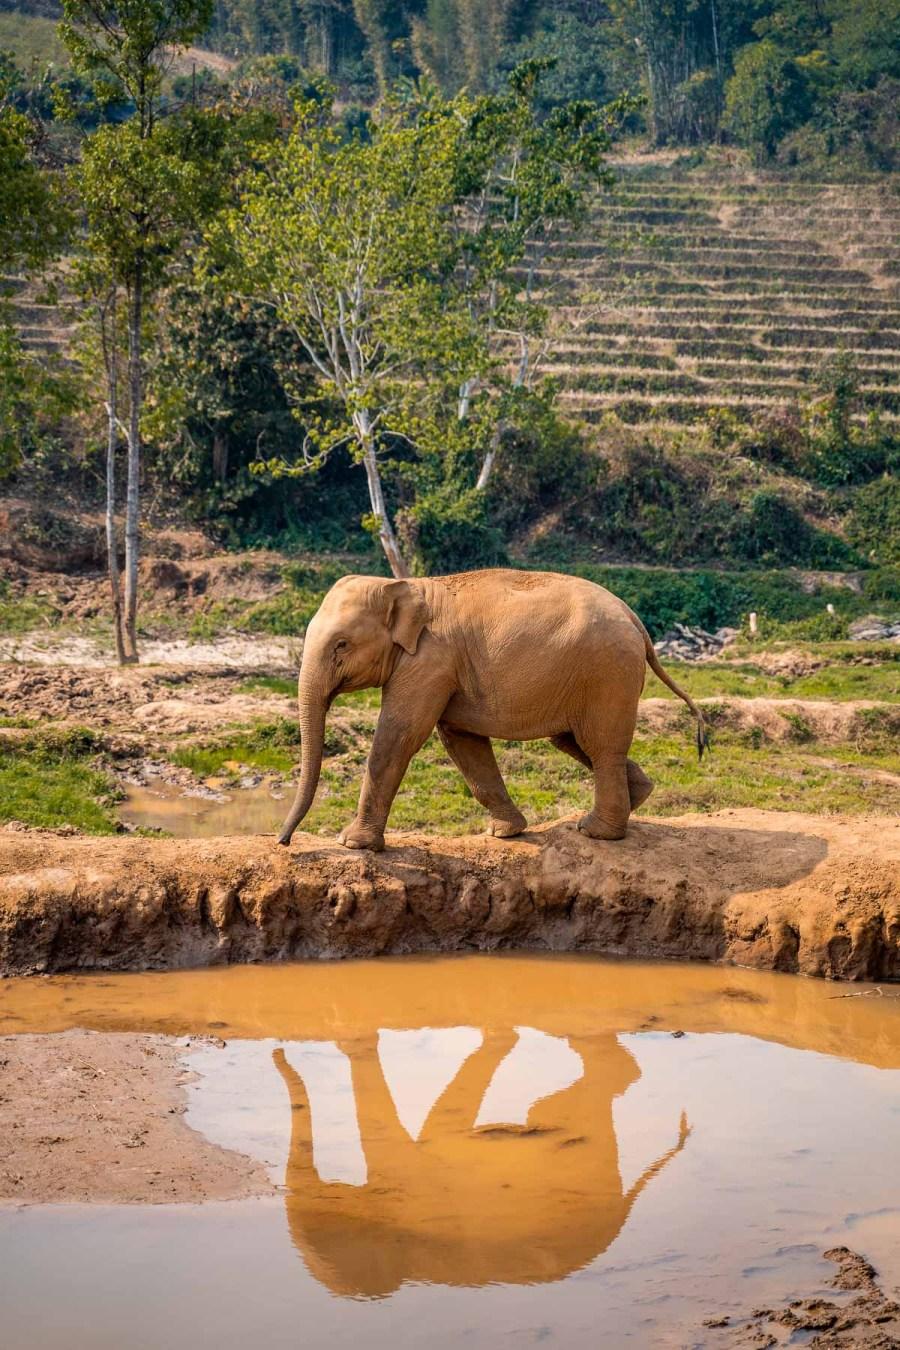 Baby elephant walking on the edge of a lake at Elephant Jungle Sanctuary Chiang Mai